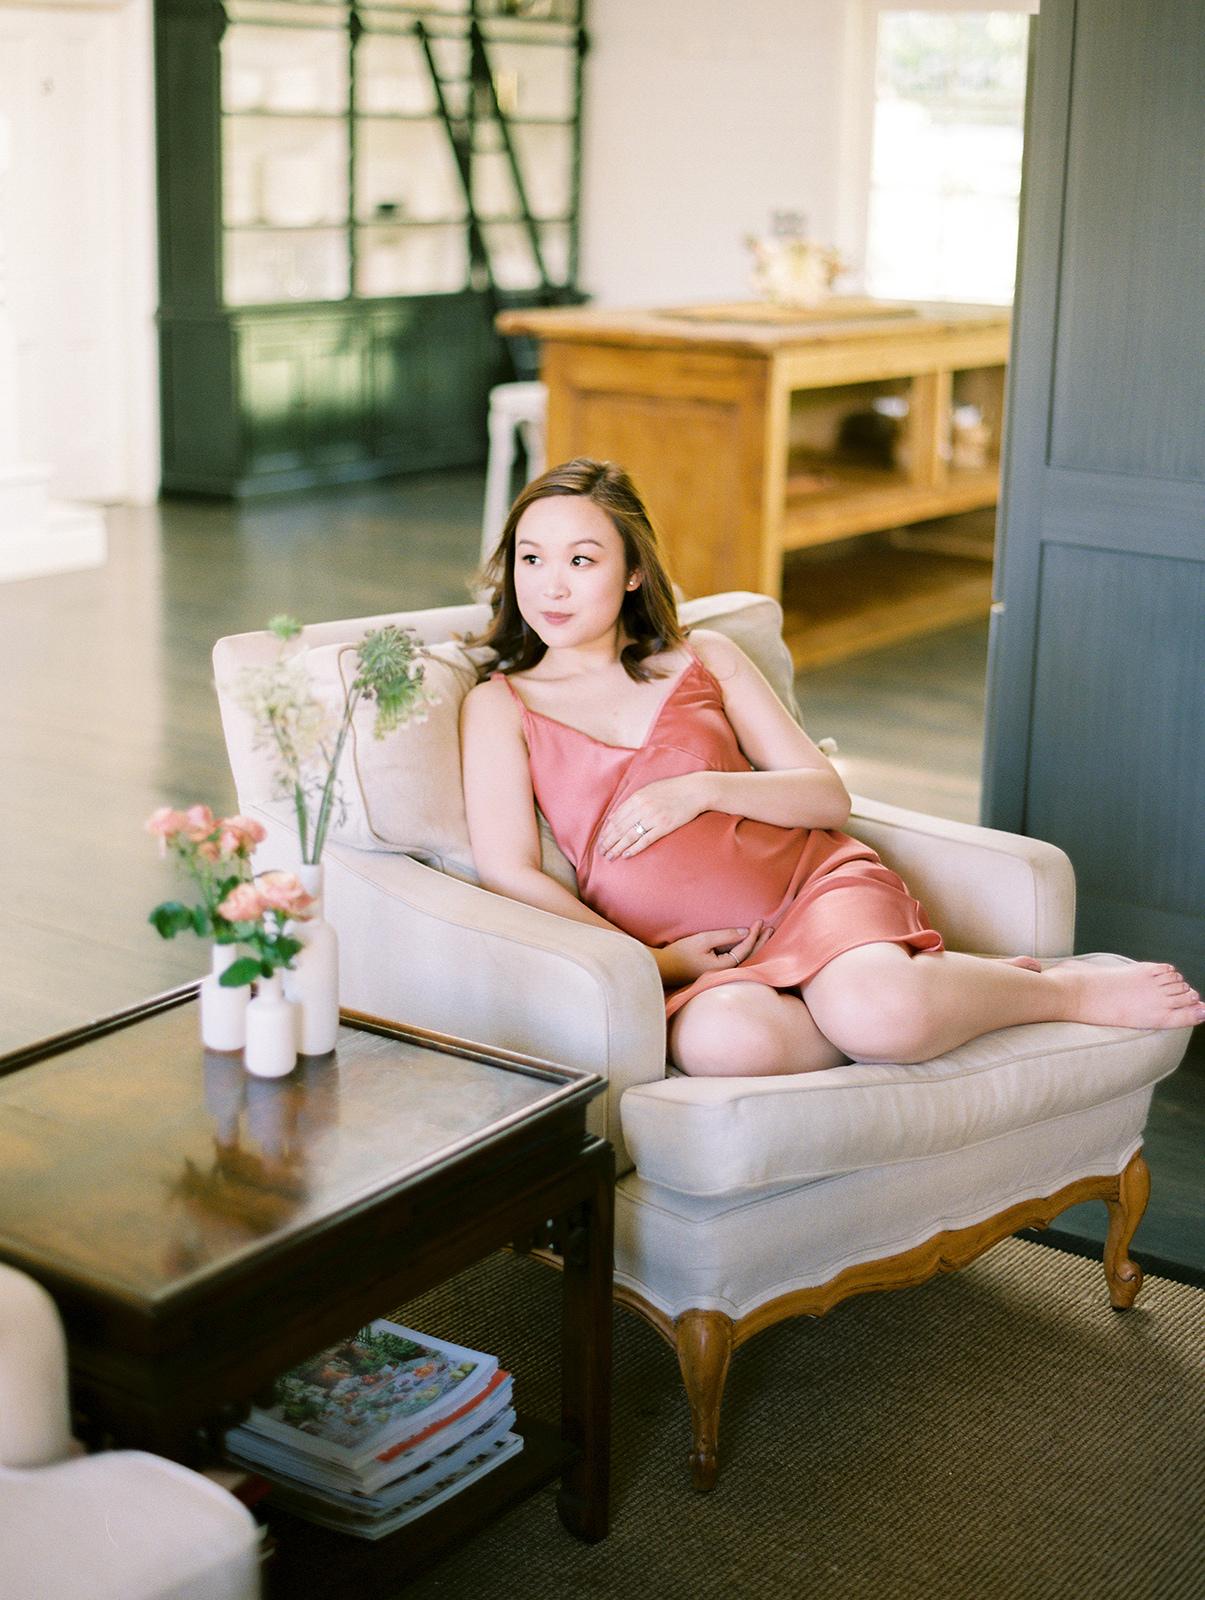 waop-charmenie_edmond-maternity-0194.jpg